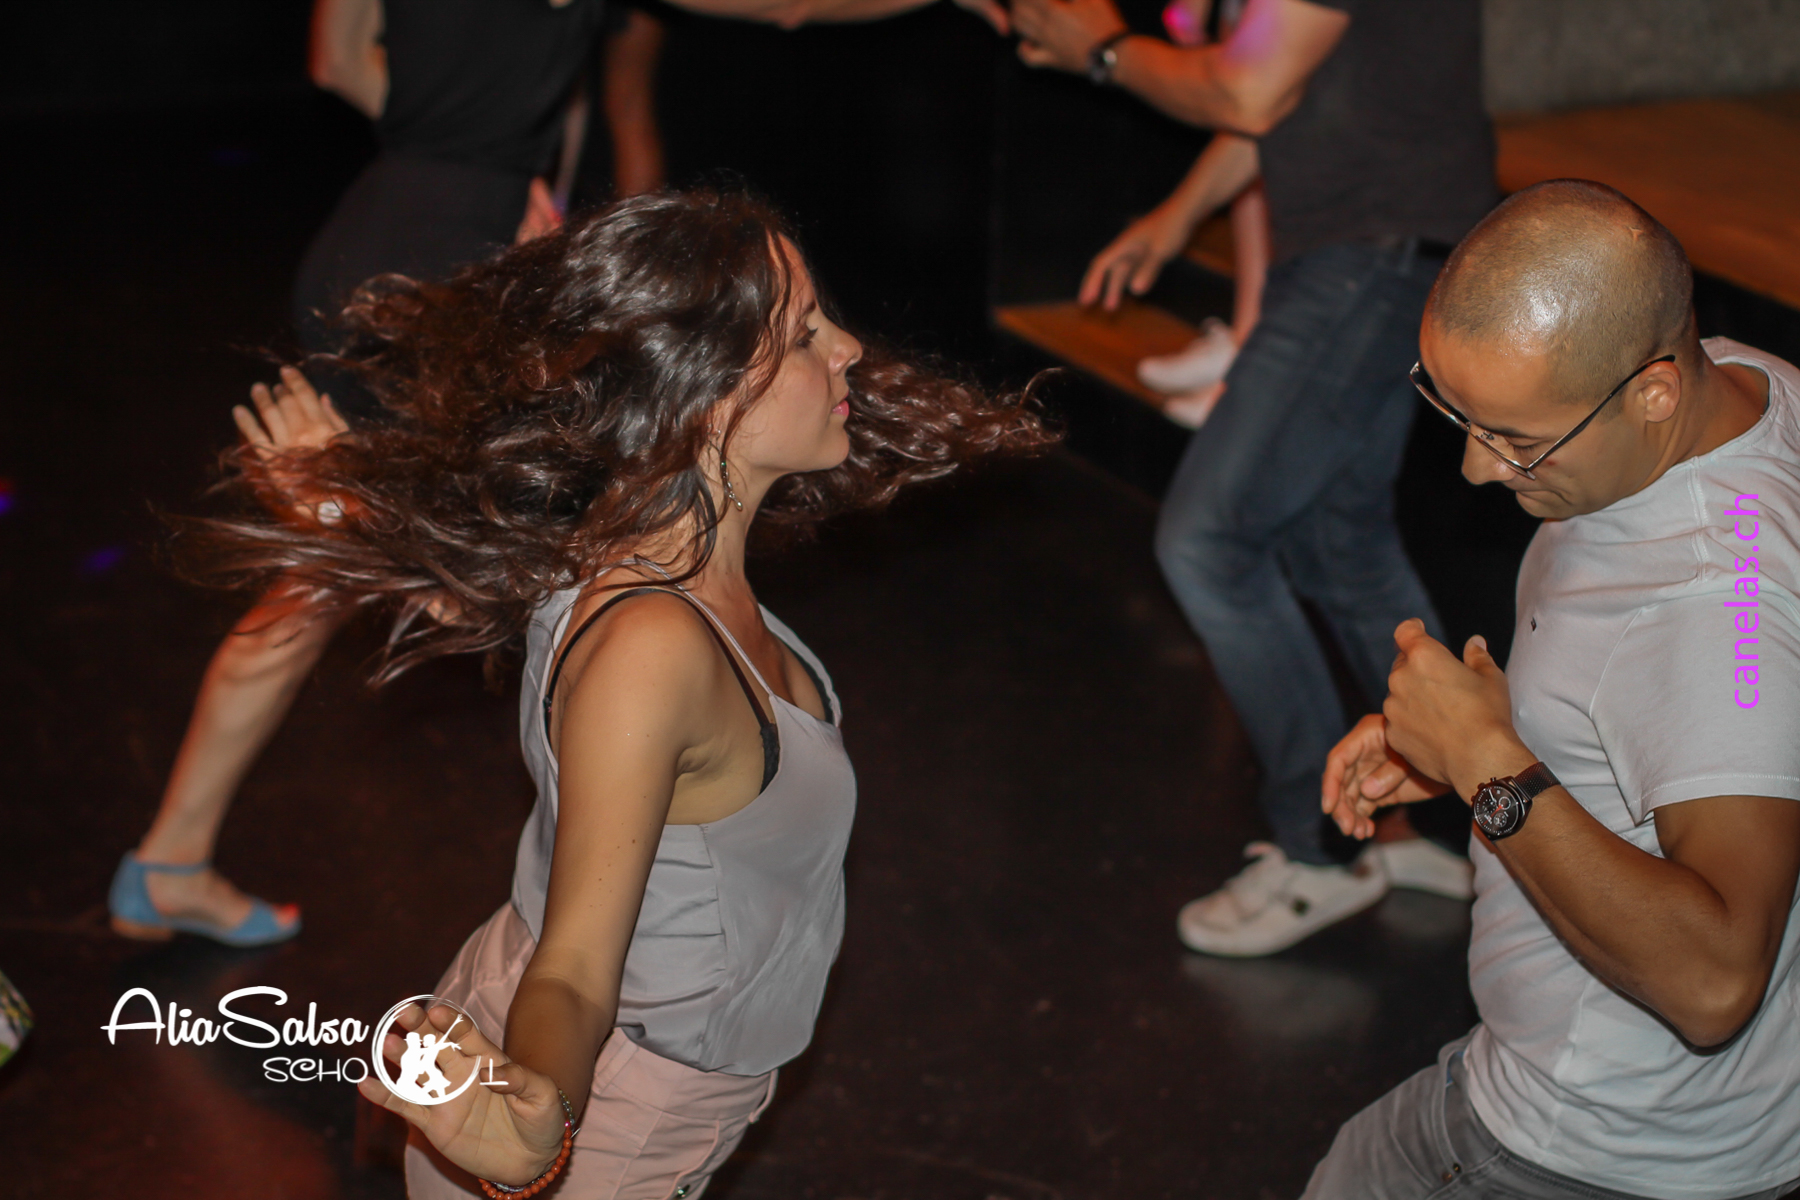 AliaSalsa ecole de danse lausanne soiree bachata salsa cubaineAlia Salsa Soireé Salsa - Bachata-59